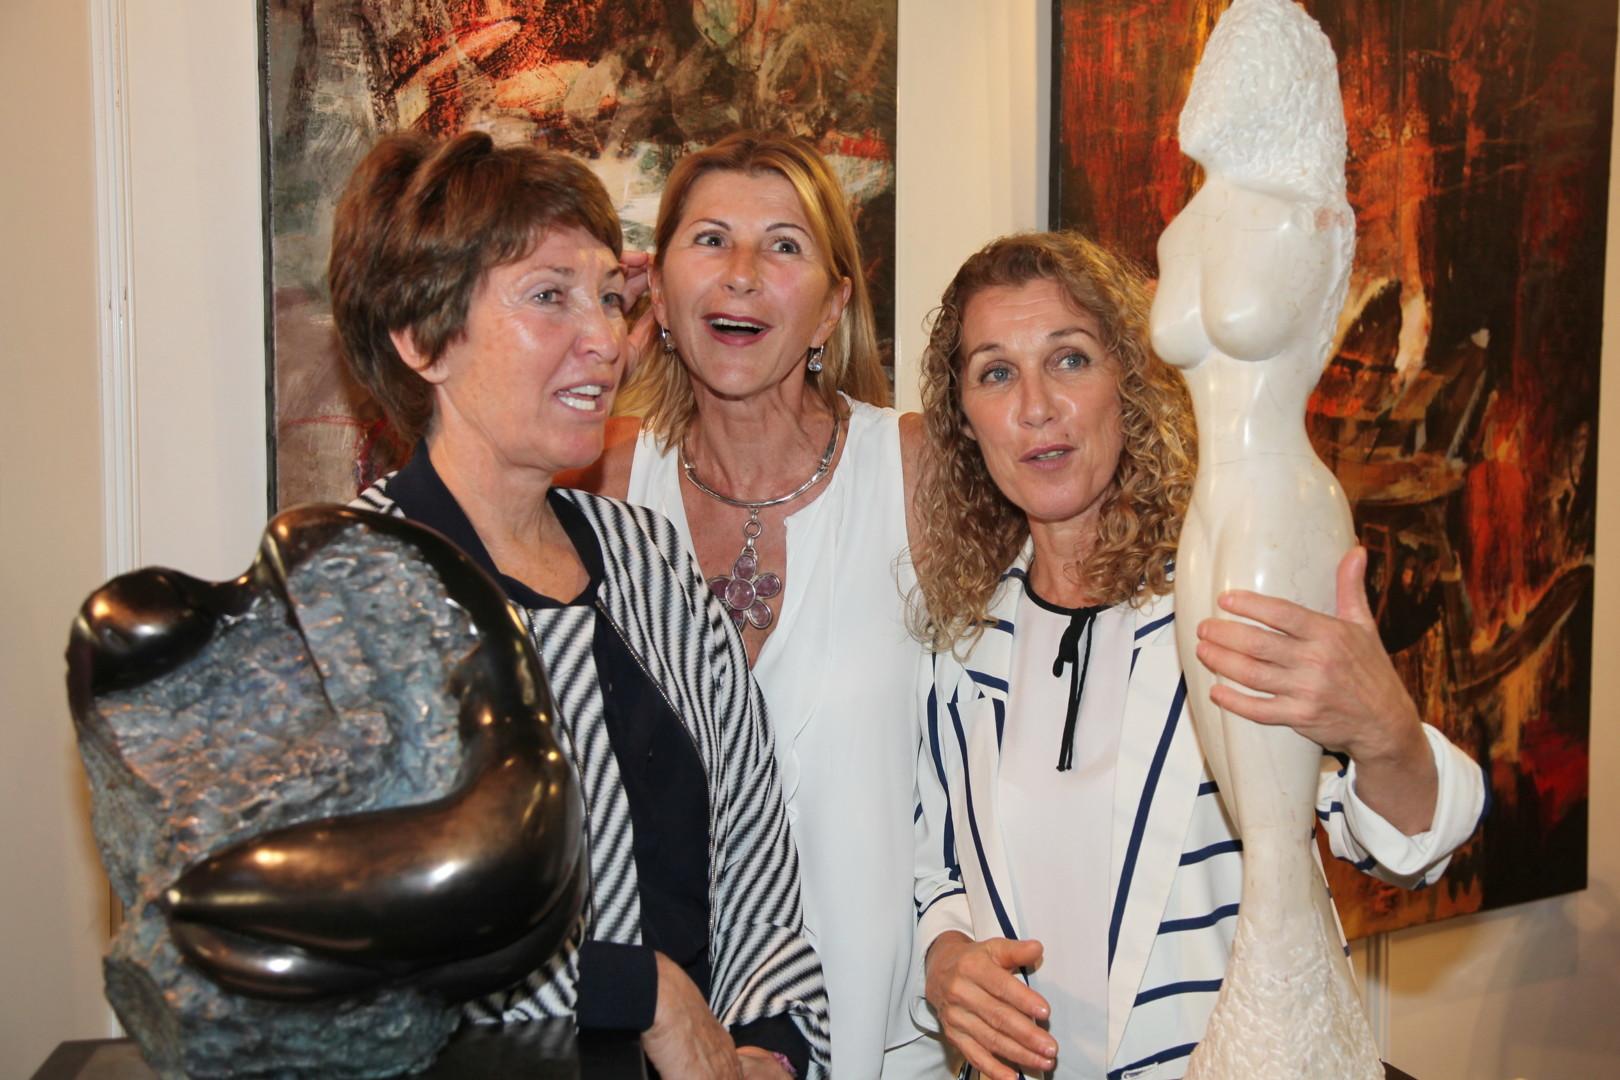 Florence   Duet - Exposition Cannes Artistes Du Monde 2015-Marina Picasso, Erka et Florence Duet